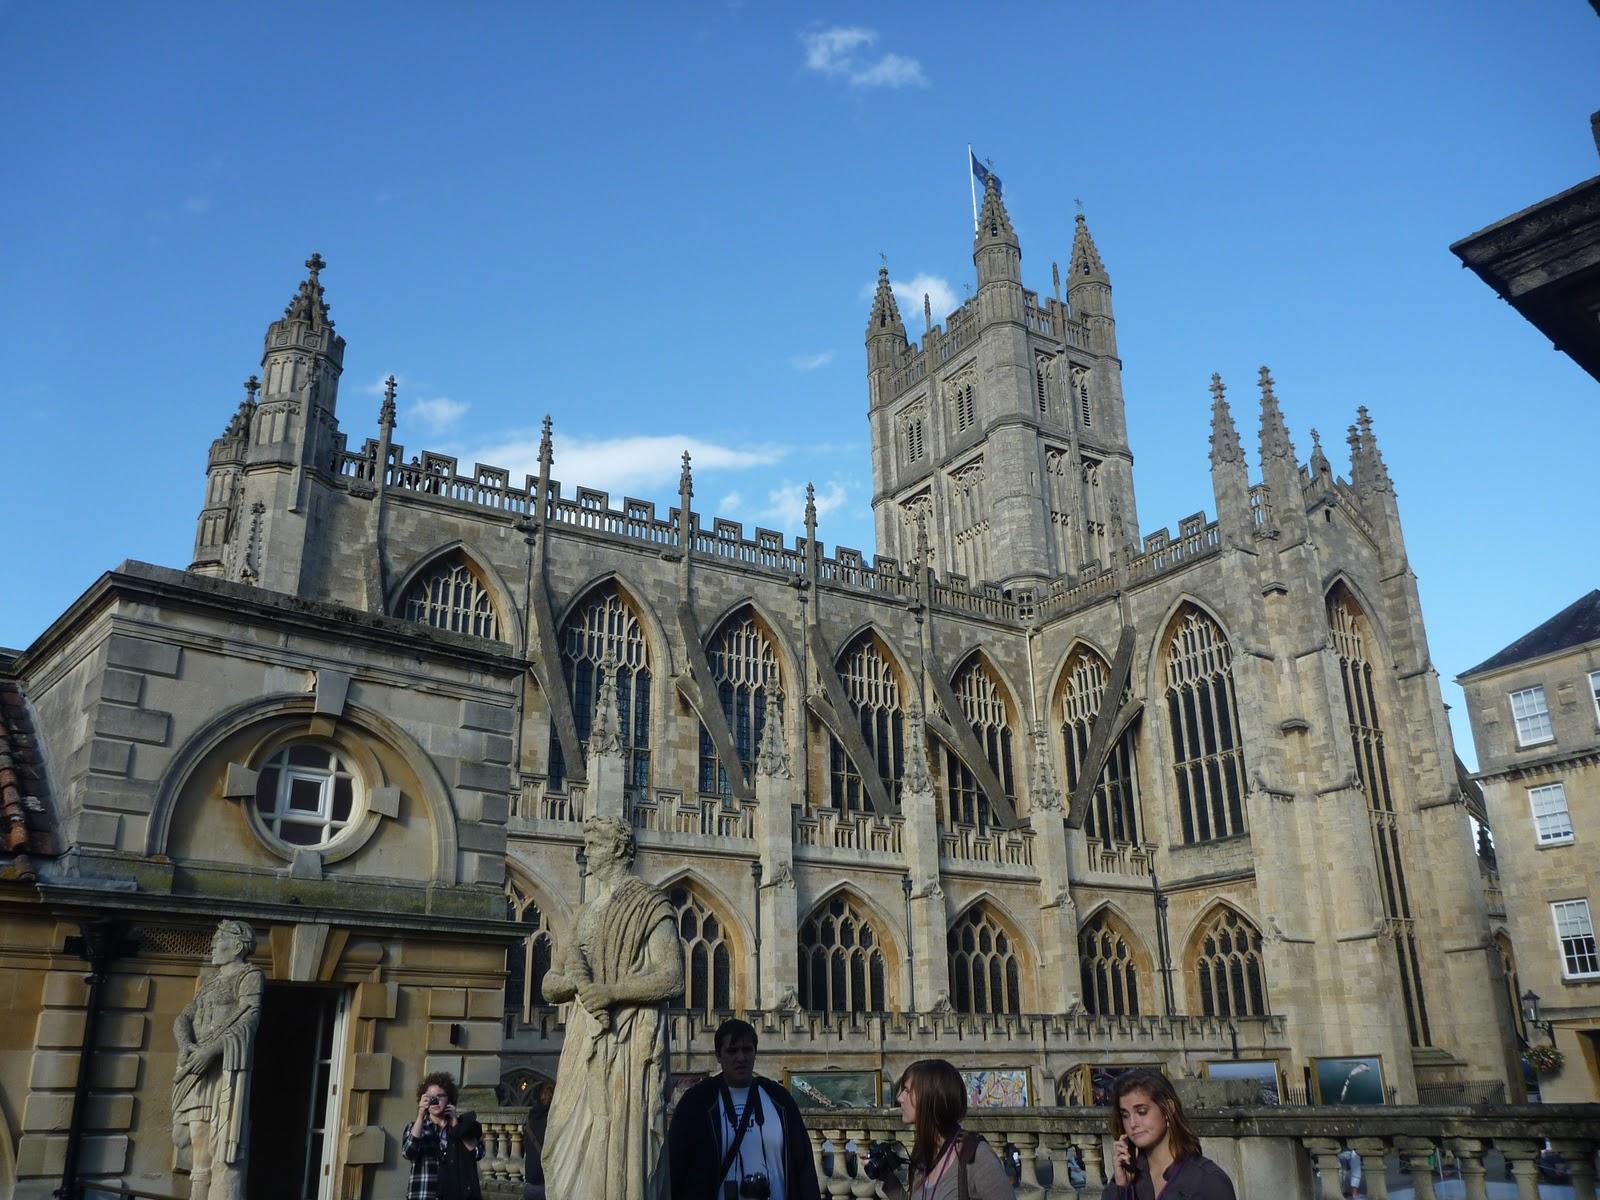 Interesting Architecture in Durham